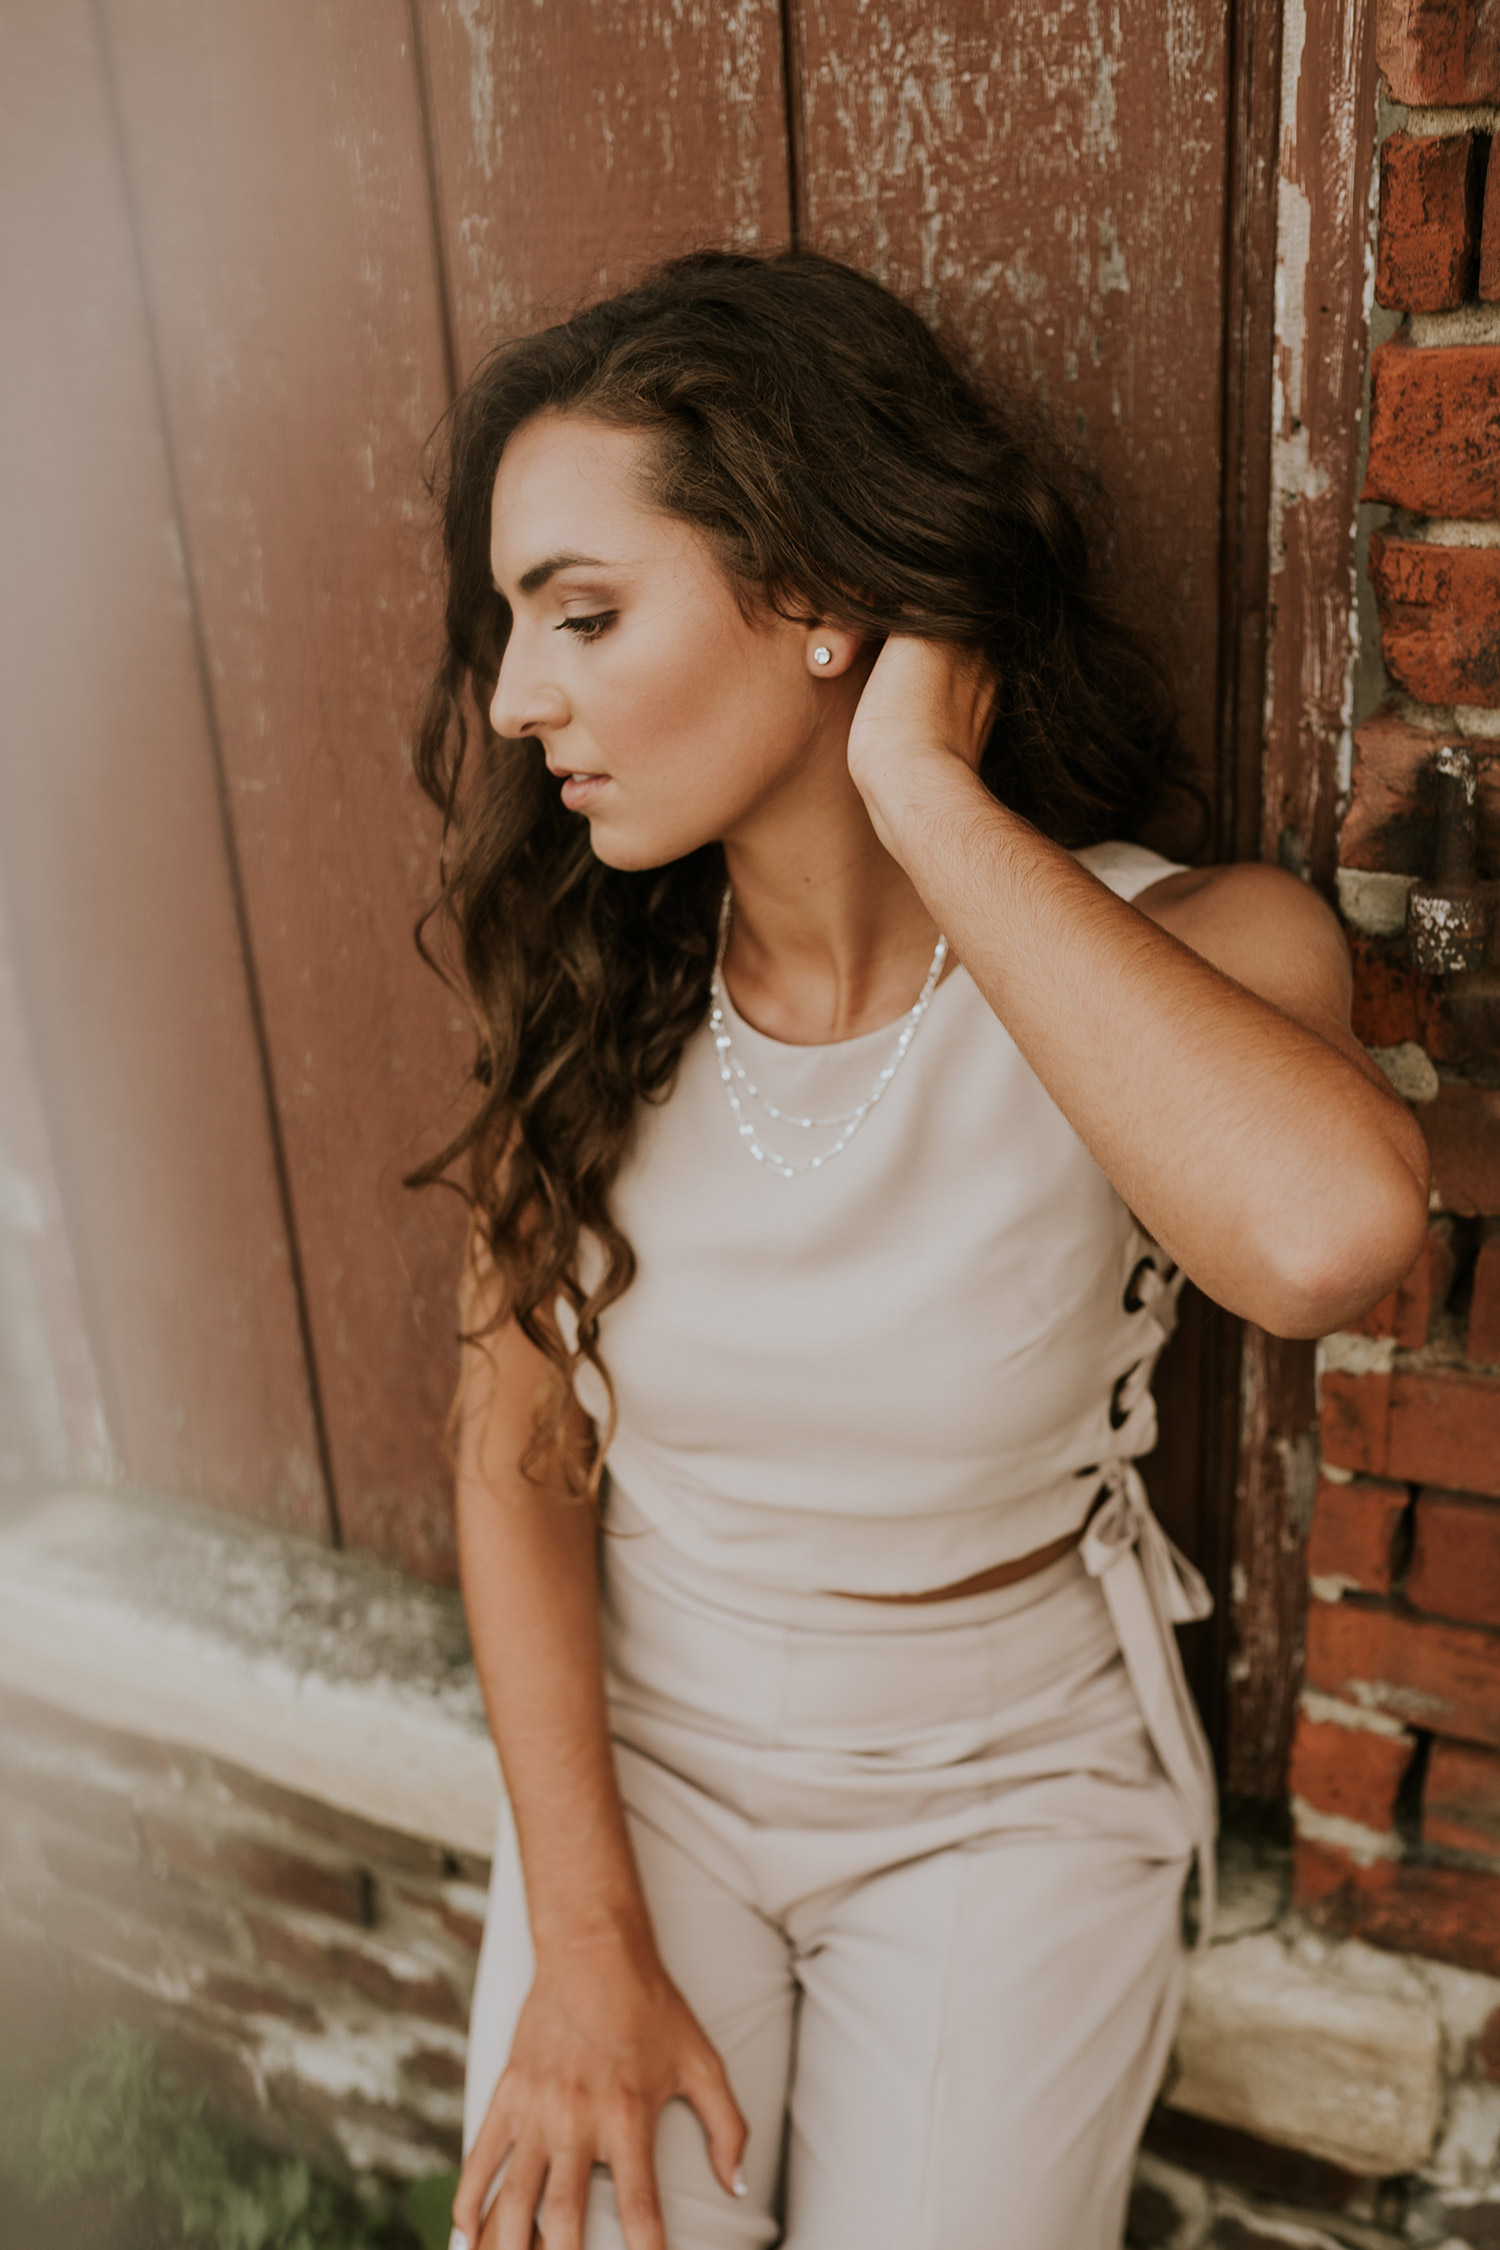 lizzy-senior-girl-modeling-in-winterset-ankeny-high-school-desmoines-iowa-raelyn-ramey-photography-46.jpg